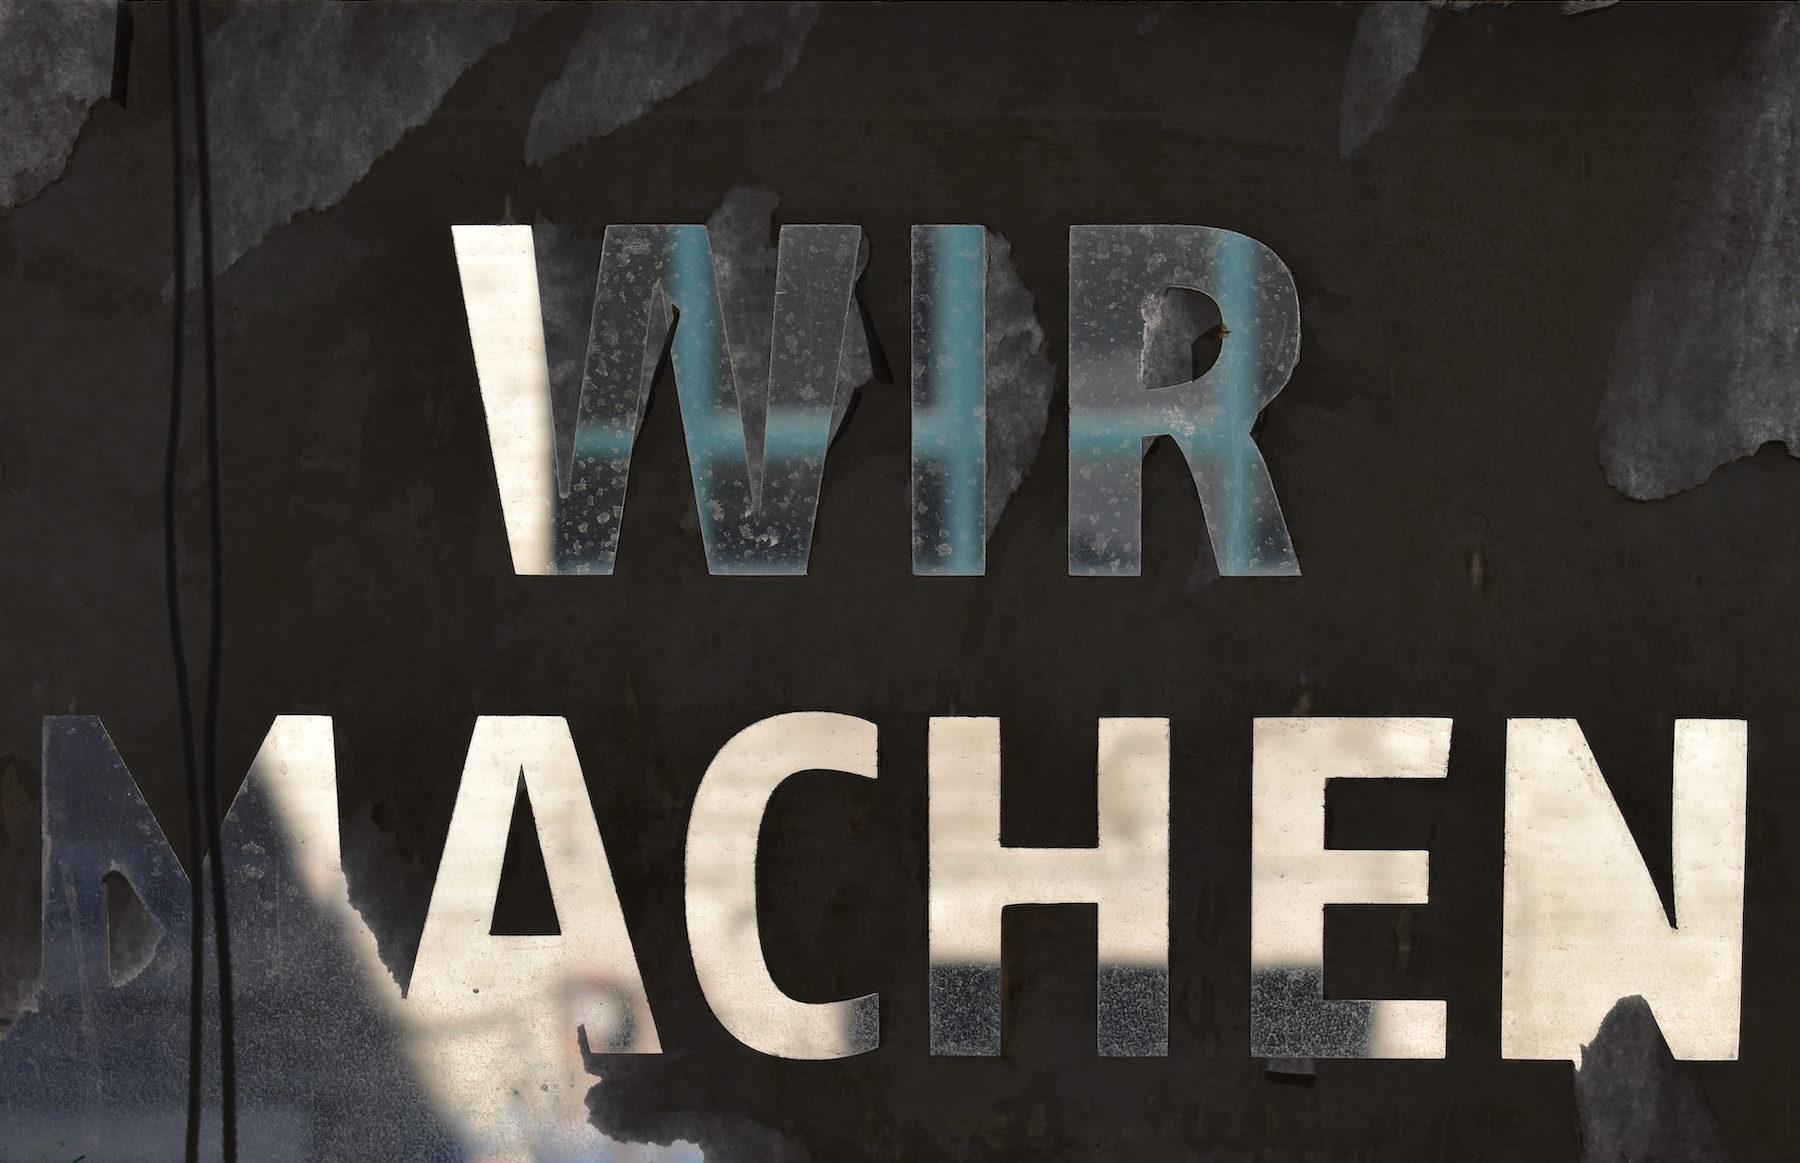 Wir Machen - We Do - taken at Fabrik23 in Berlin